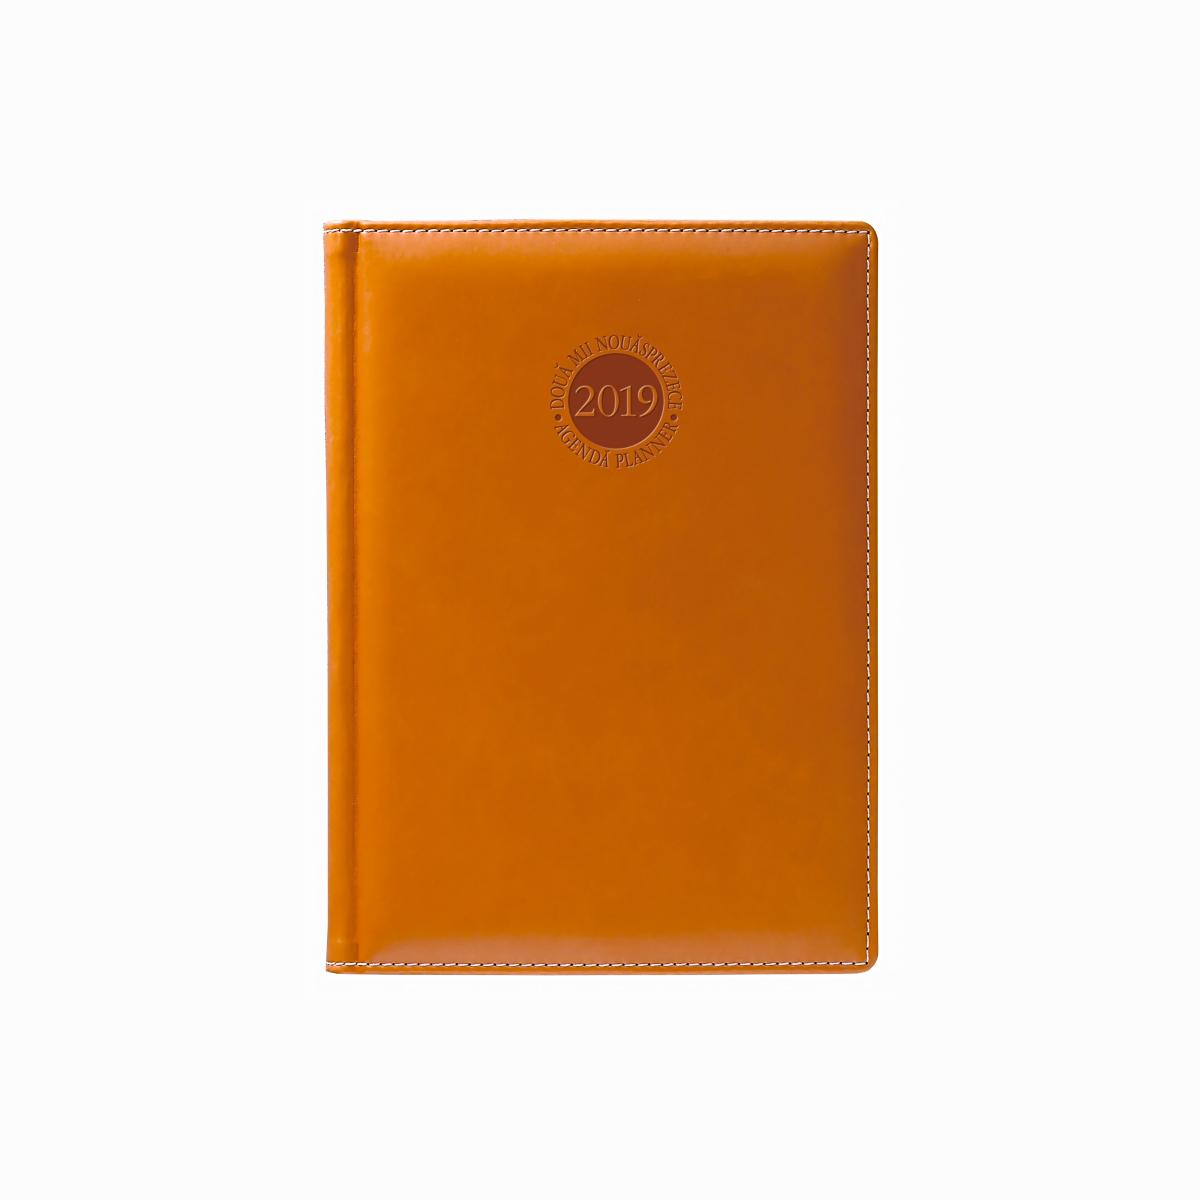 Agendă A5, Datată, 352 File, 2019, Premium Deluxe, Amsterdam, Diverse Culori, Herlitz, 11415346